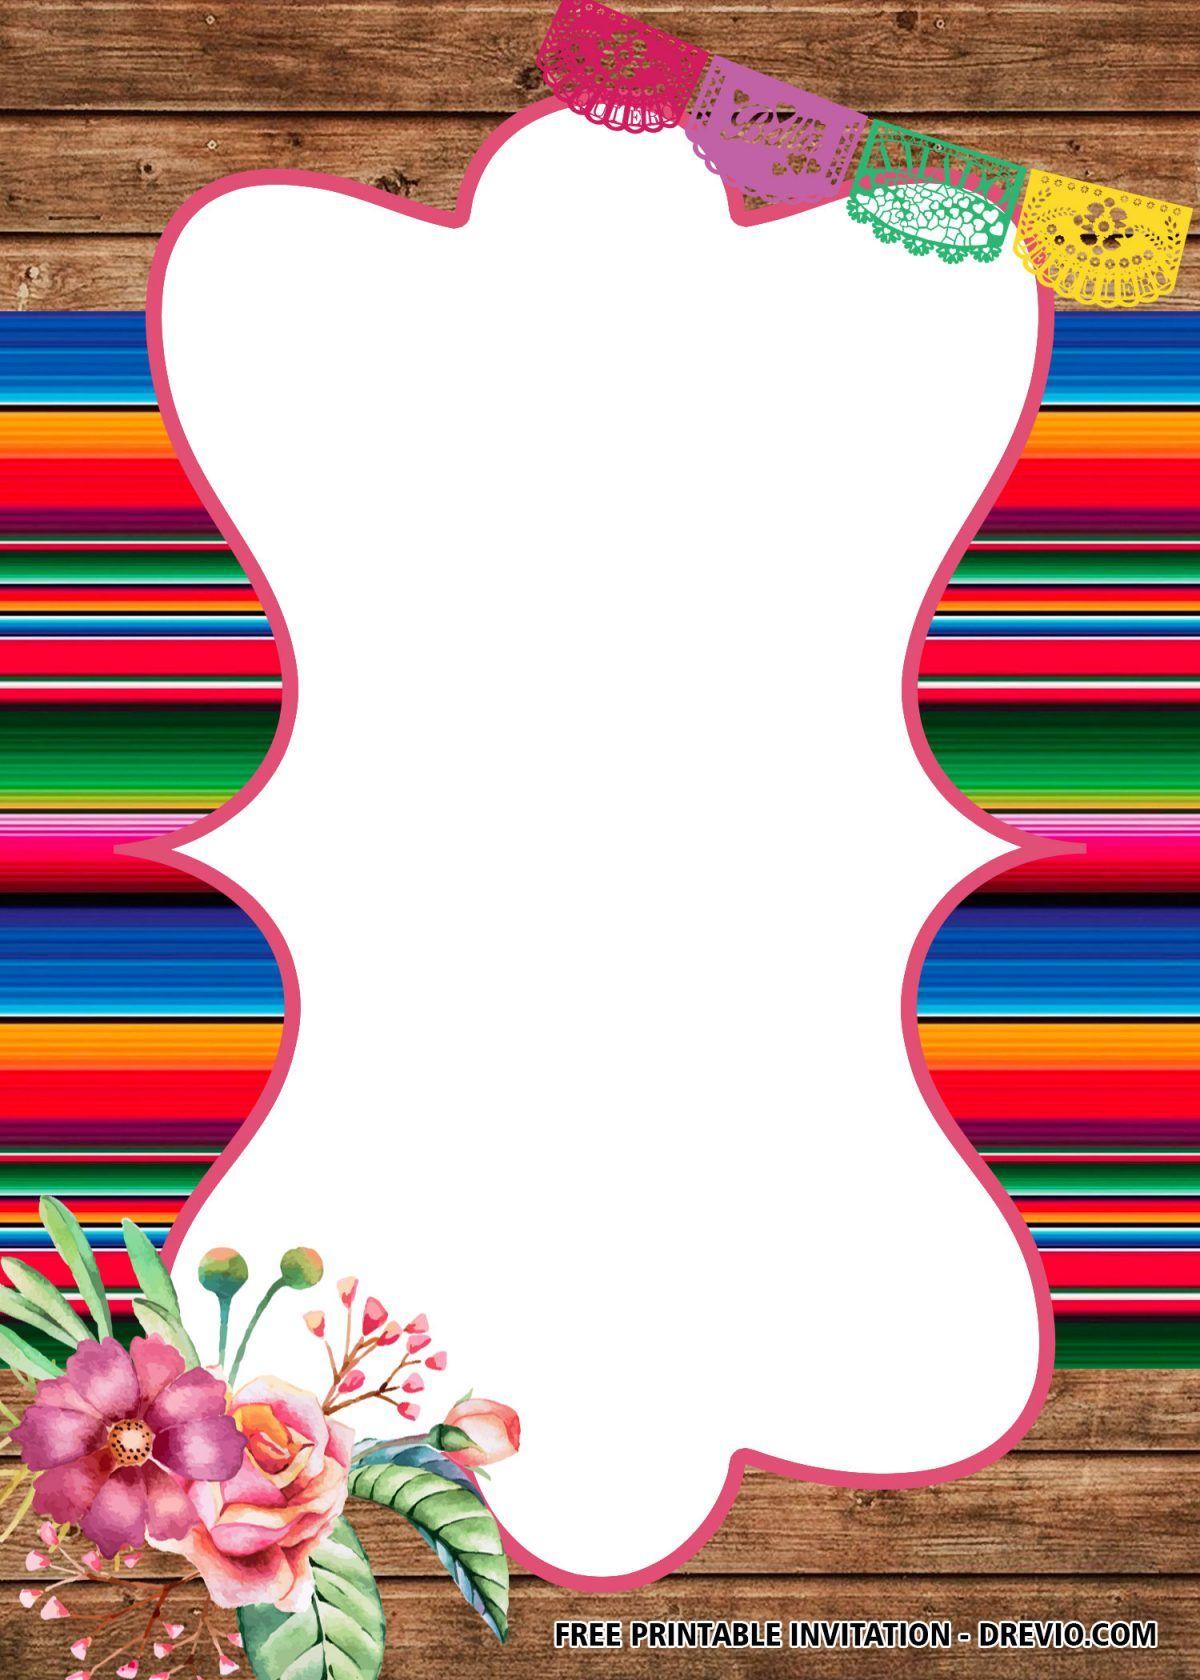 Free Fiesta Party Birthday Invitation Templates Free Printable Birthda Free Printable Birthday Invitations Mexican Invitations Fiesta Baby Shower Invitations